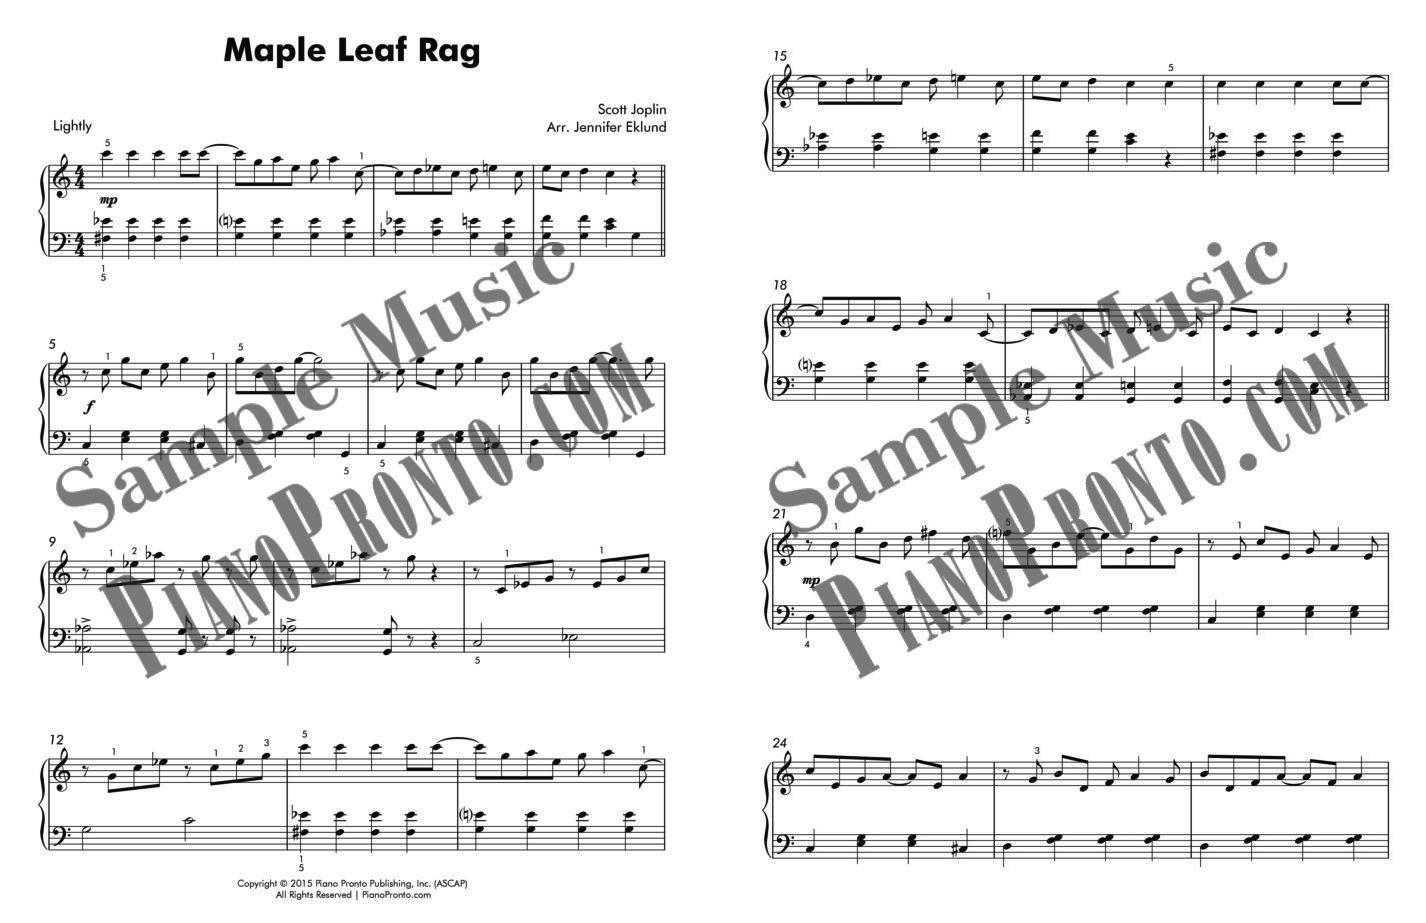 Music Notes Maple Leaf Rag Scott Joplin Easy Piano Sheet Music